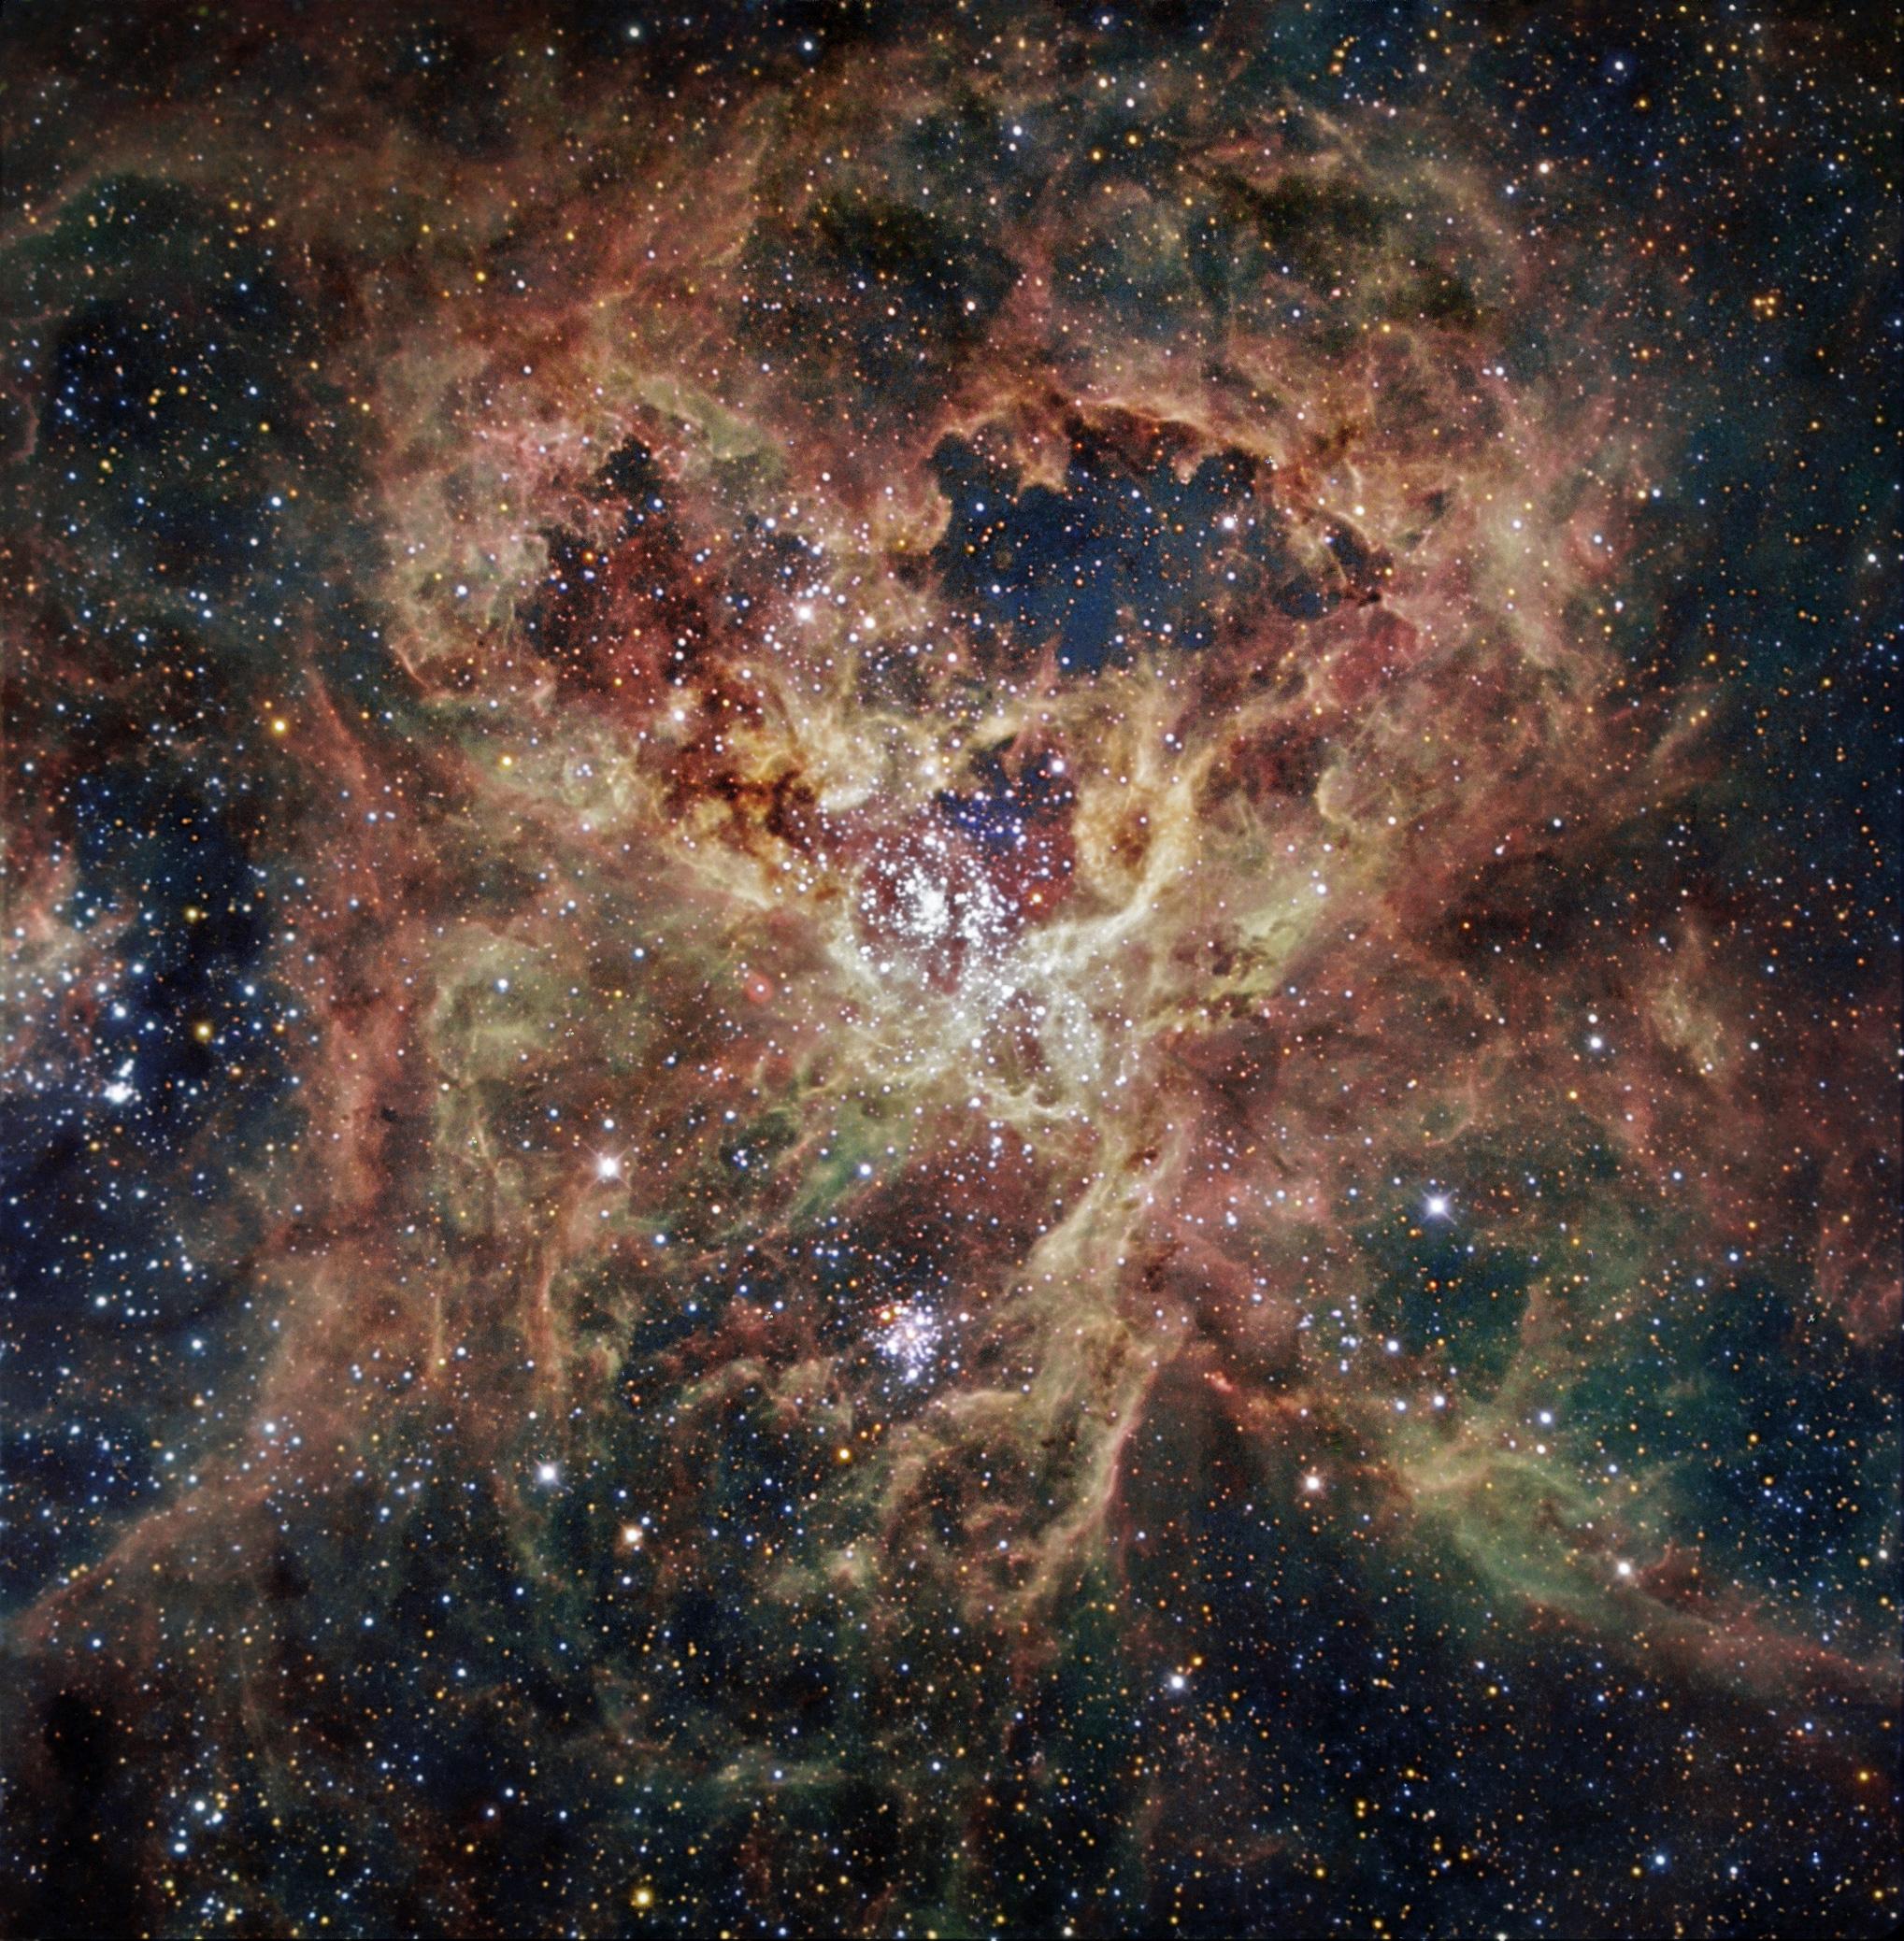 File:The Tarantula Nebula (30 Doradus or NGC 2070).jpg.